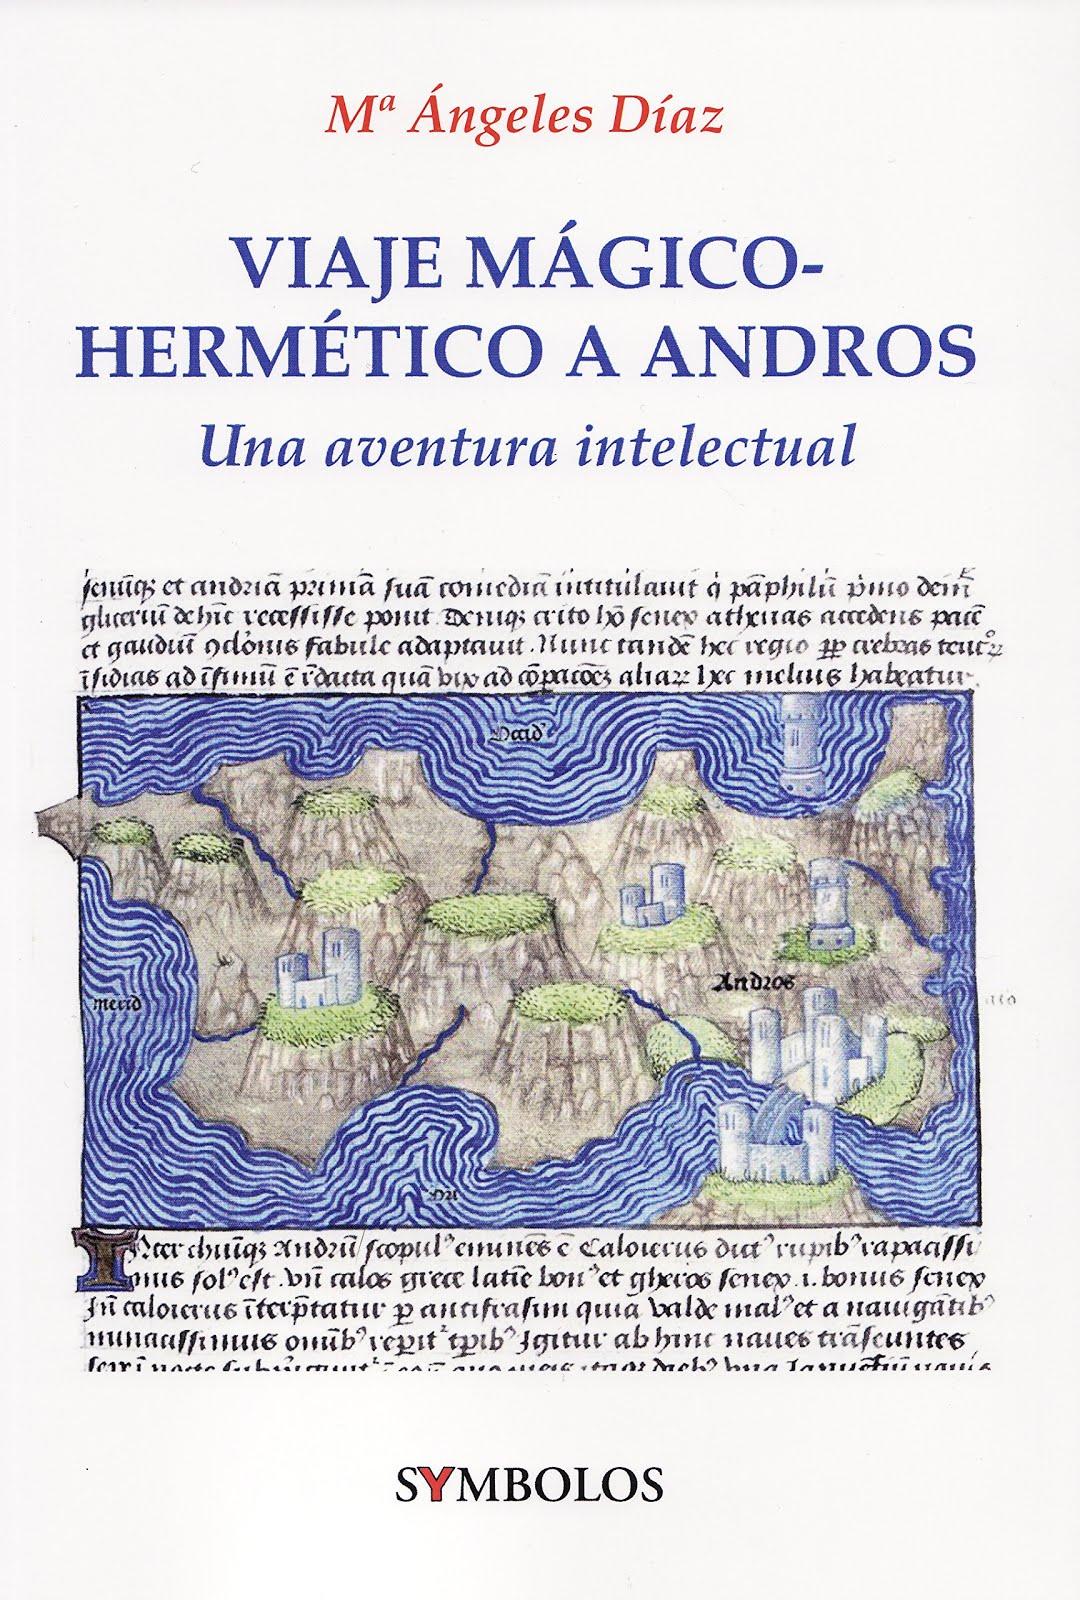 Viaje Mágico Hermético a Andros. Una Aventura intelectual. Mª Ángeles Díaz.